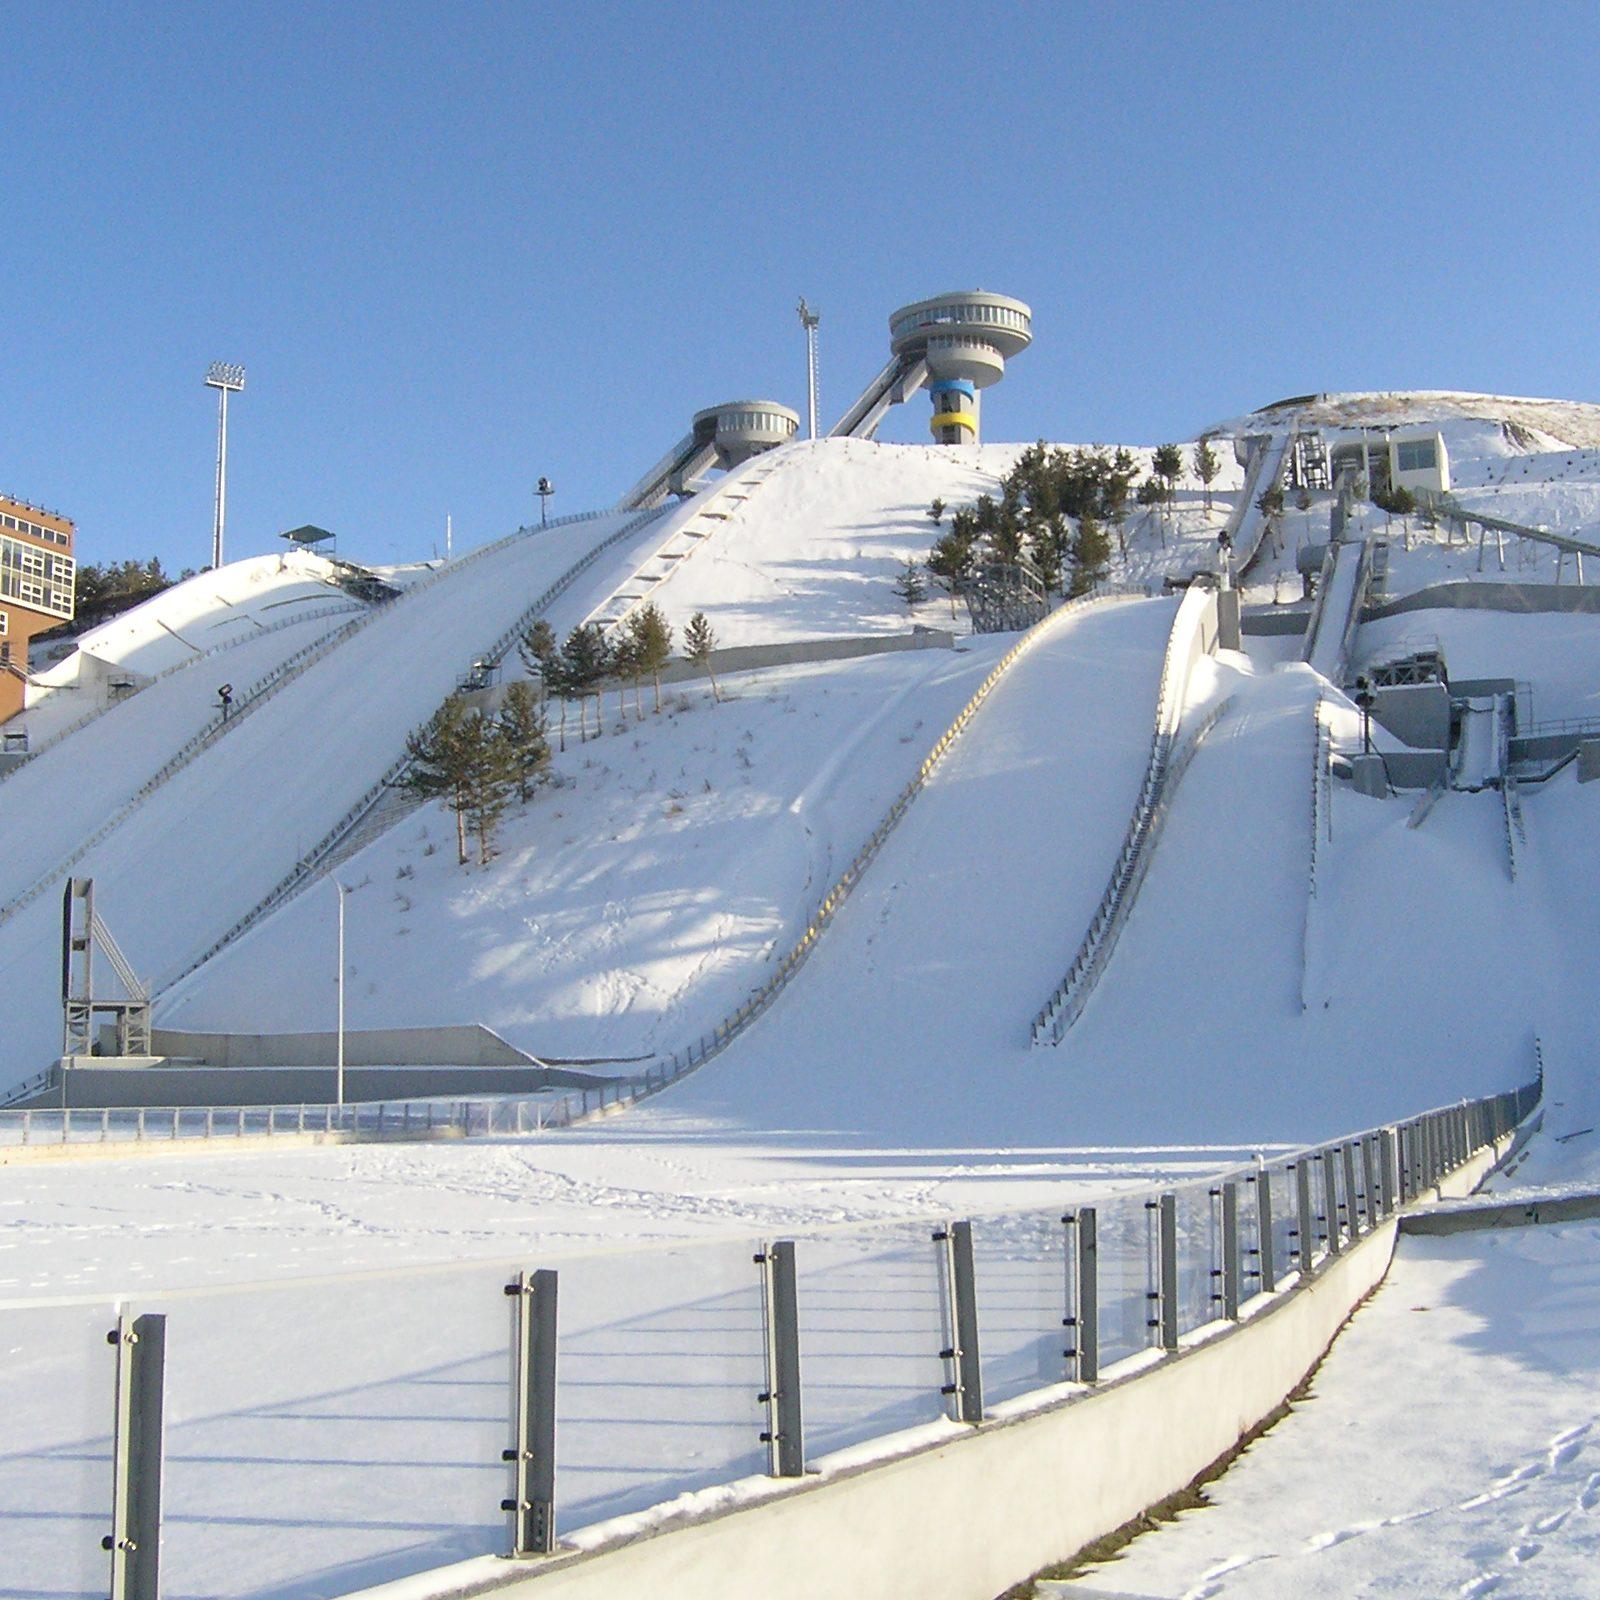 Erzurum Ski Resort